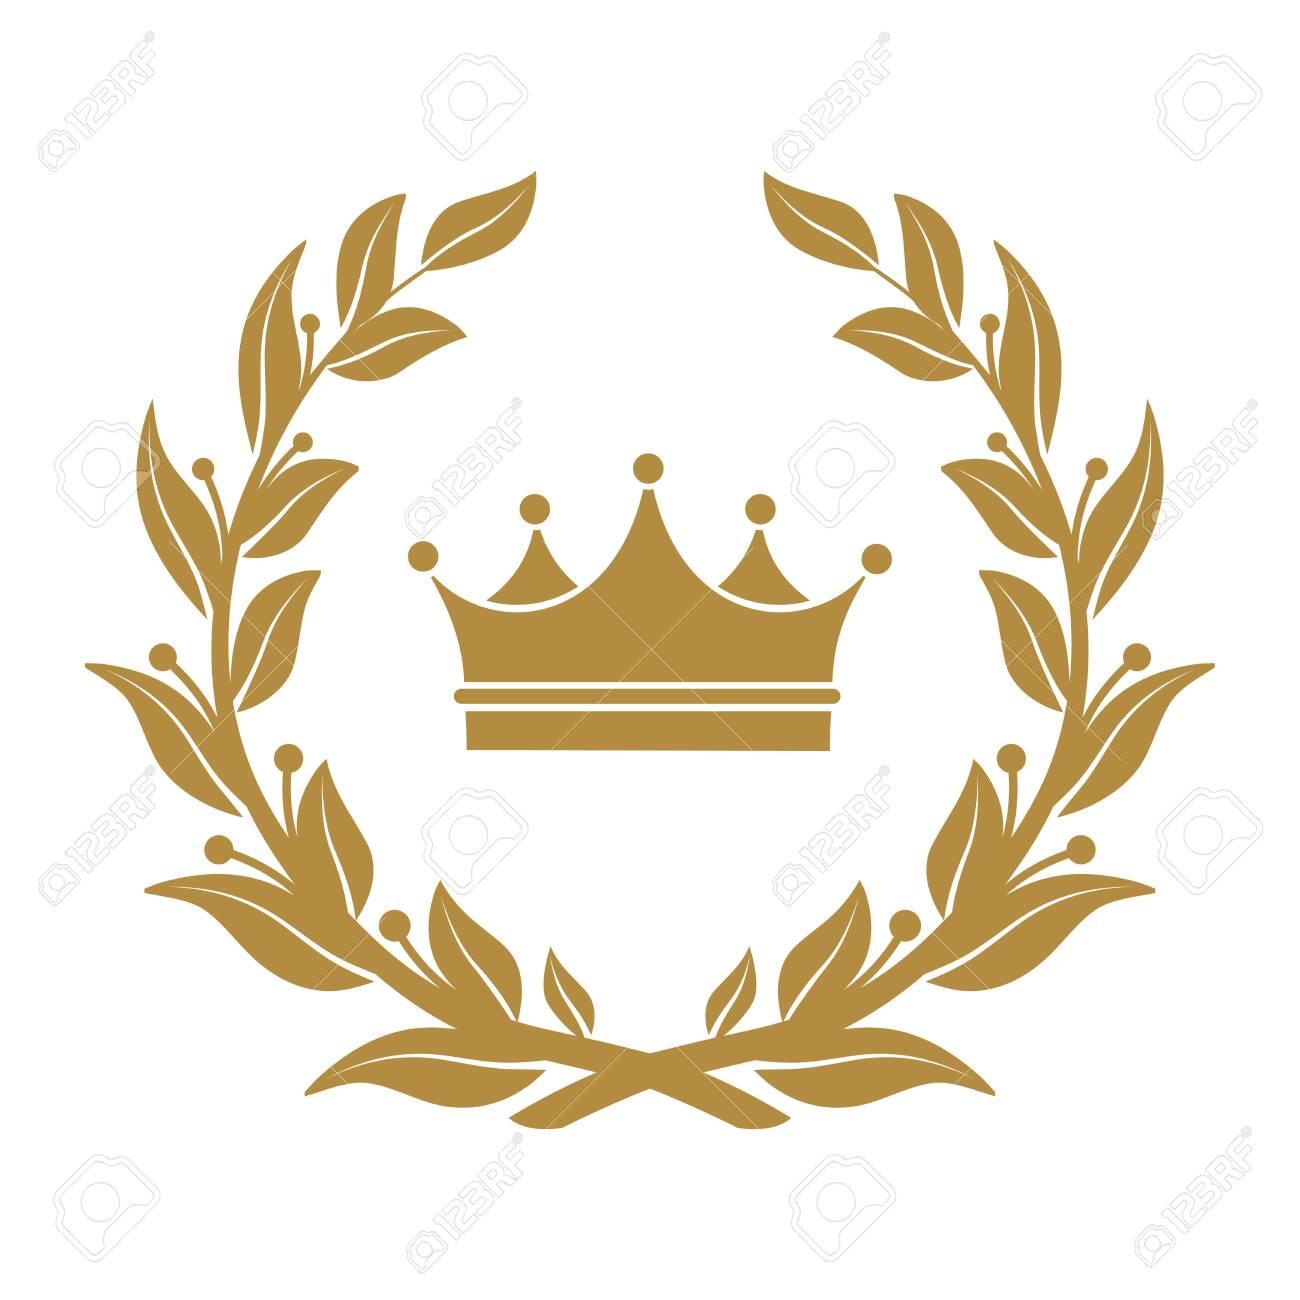 Heraldic symbol crown in laurel leaves. - 118684604